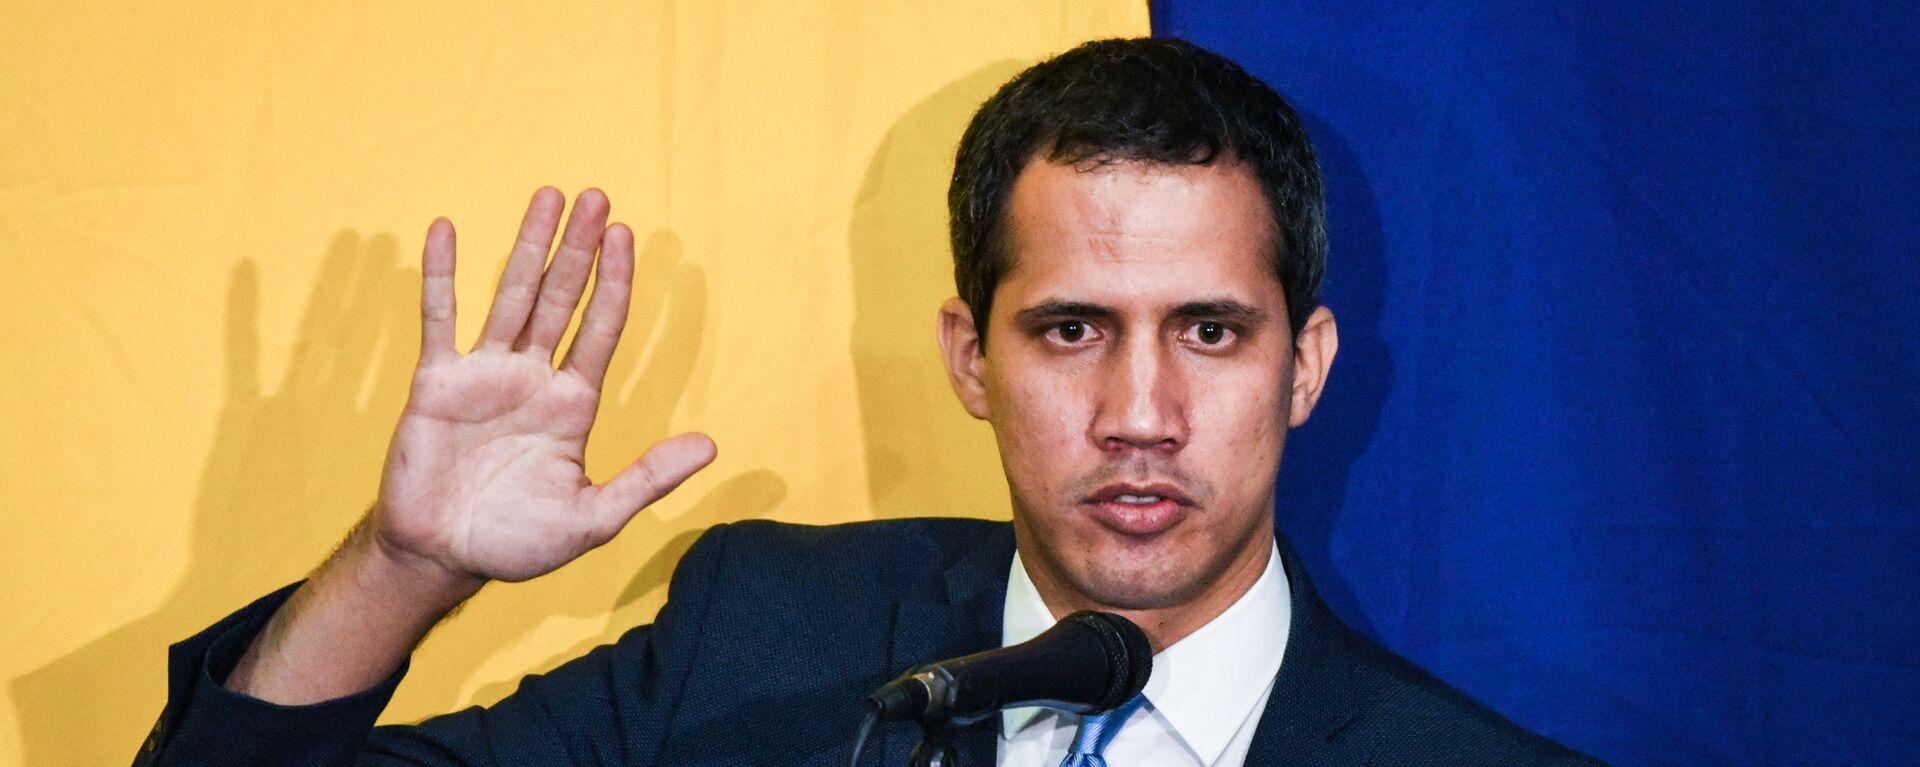 Juan Guaidó, dirigente opositor venezolano - Sputnik Mundo, 1920, 13.05.2021